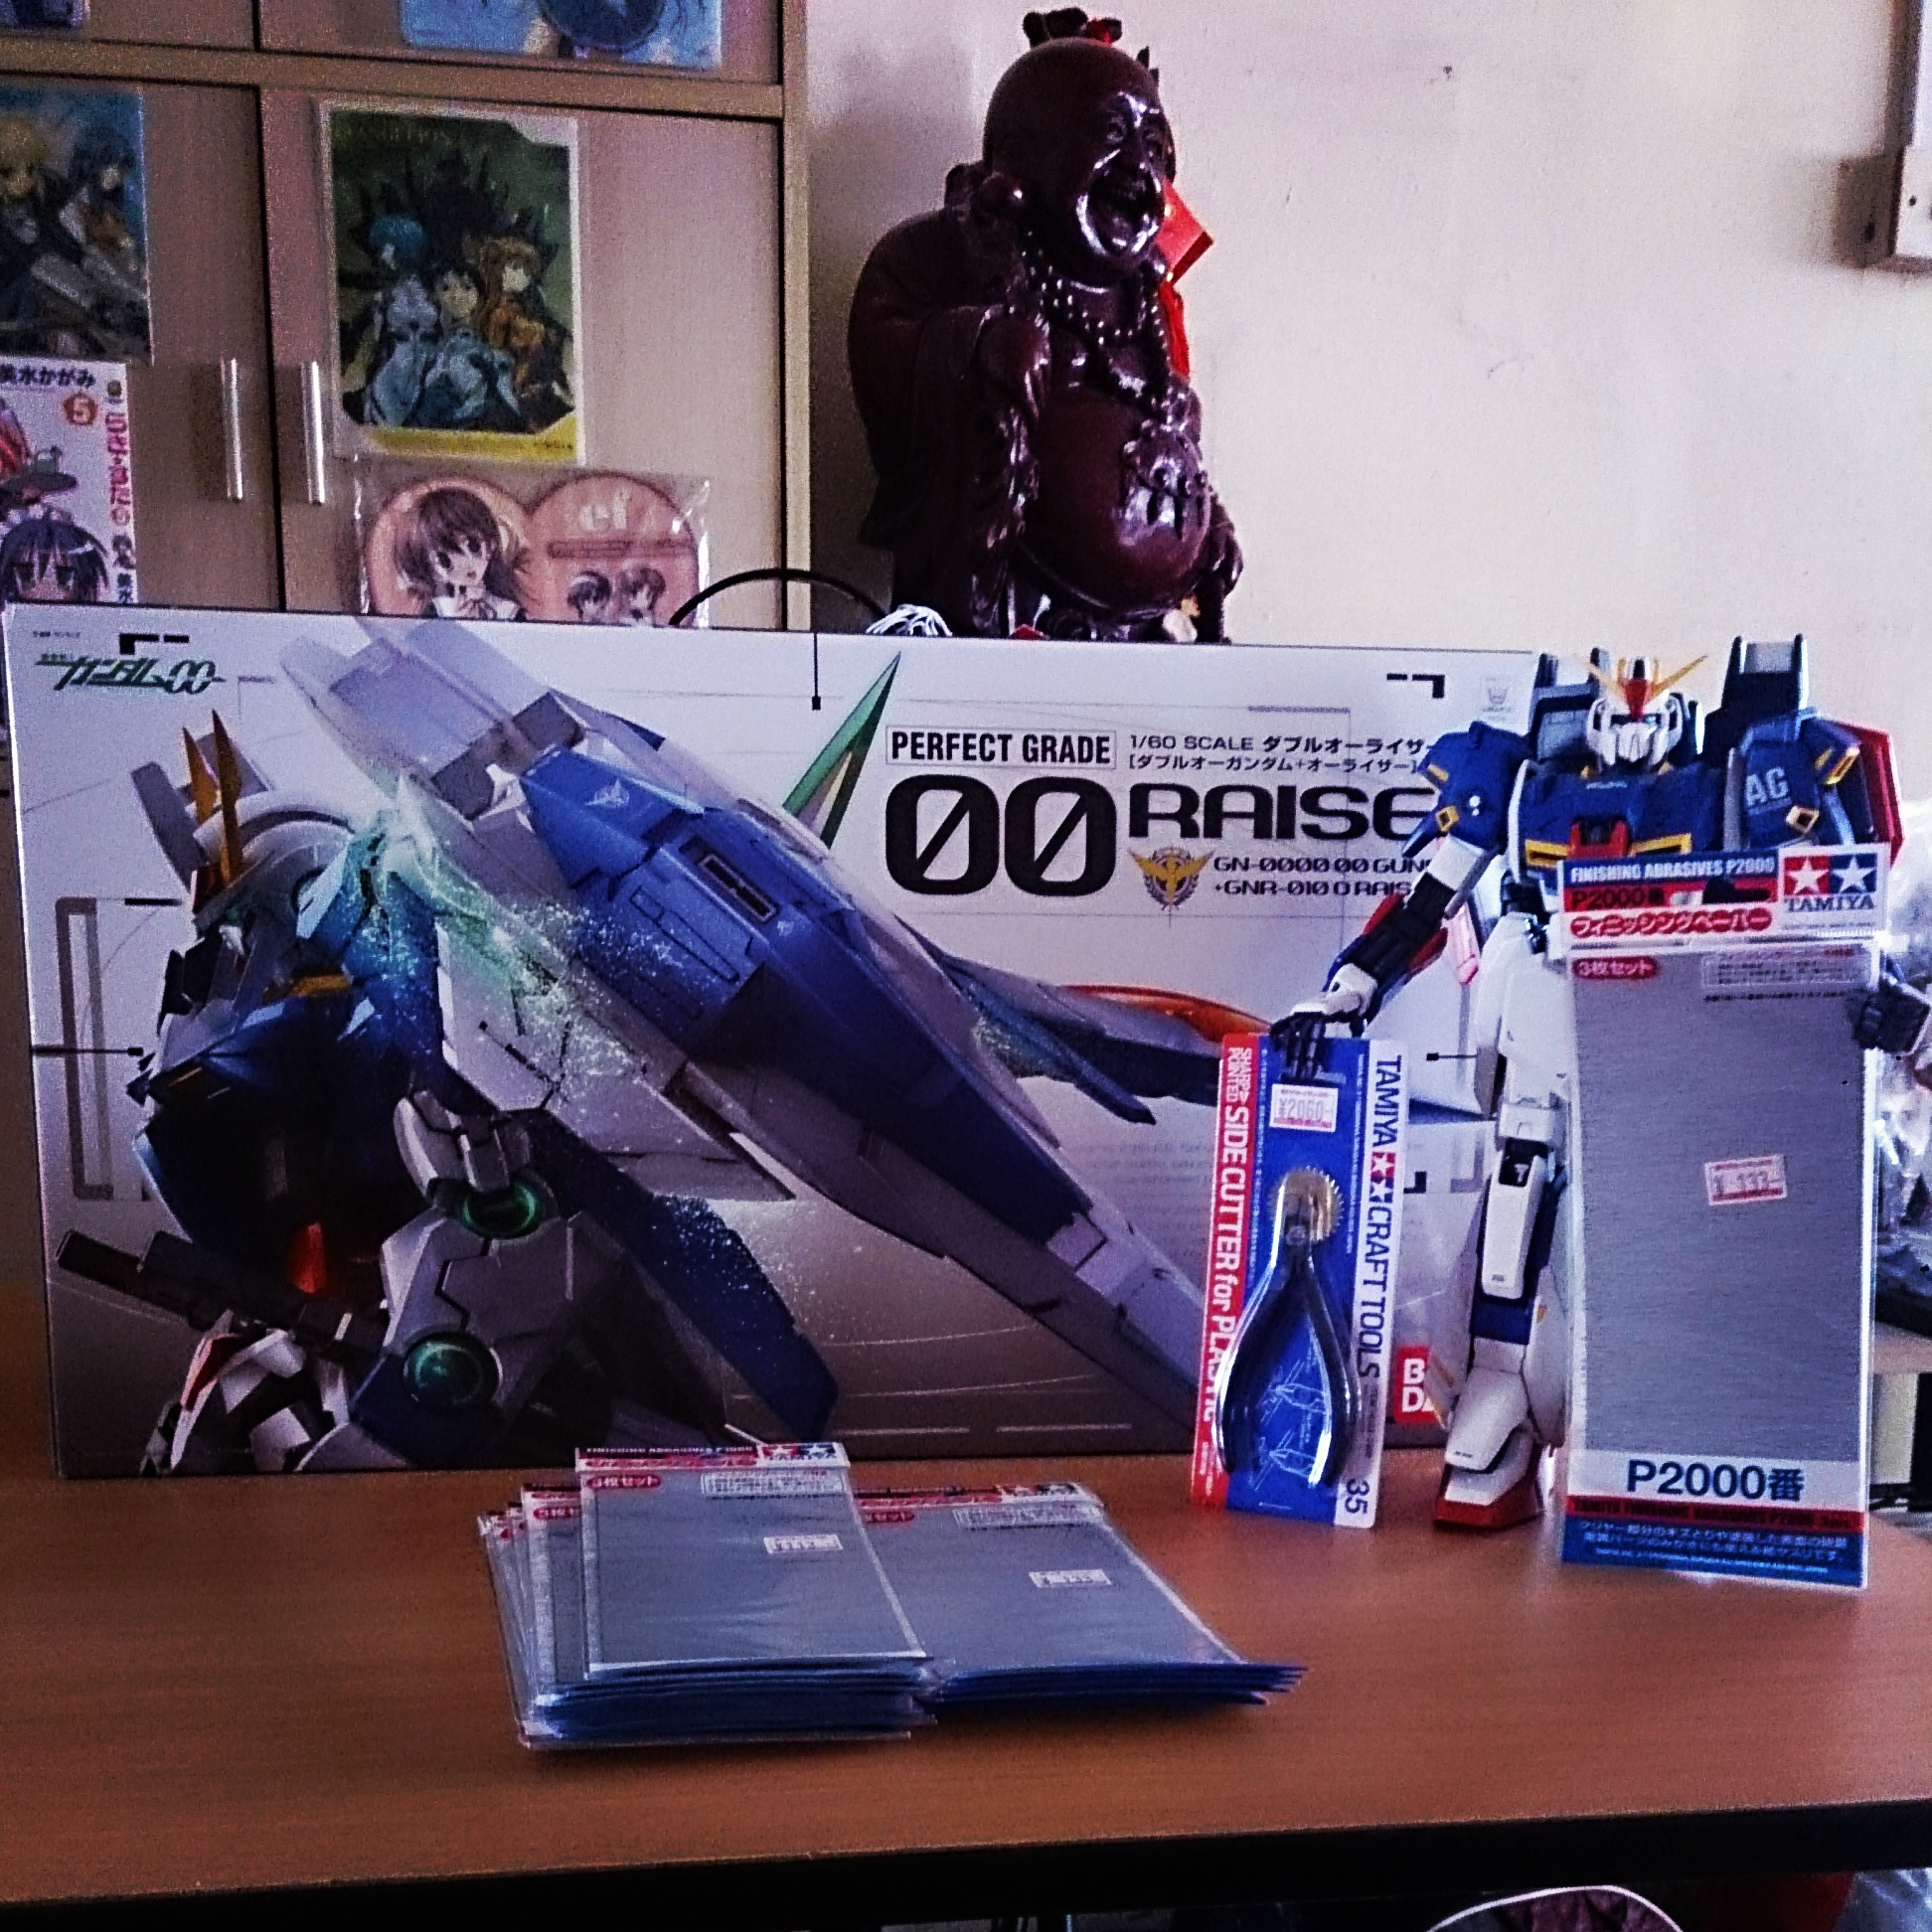 1/60 scale PG Gundam 00 Raiser build progress